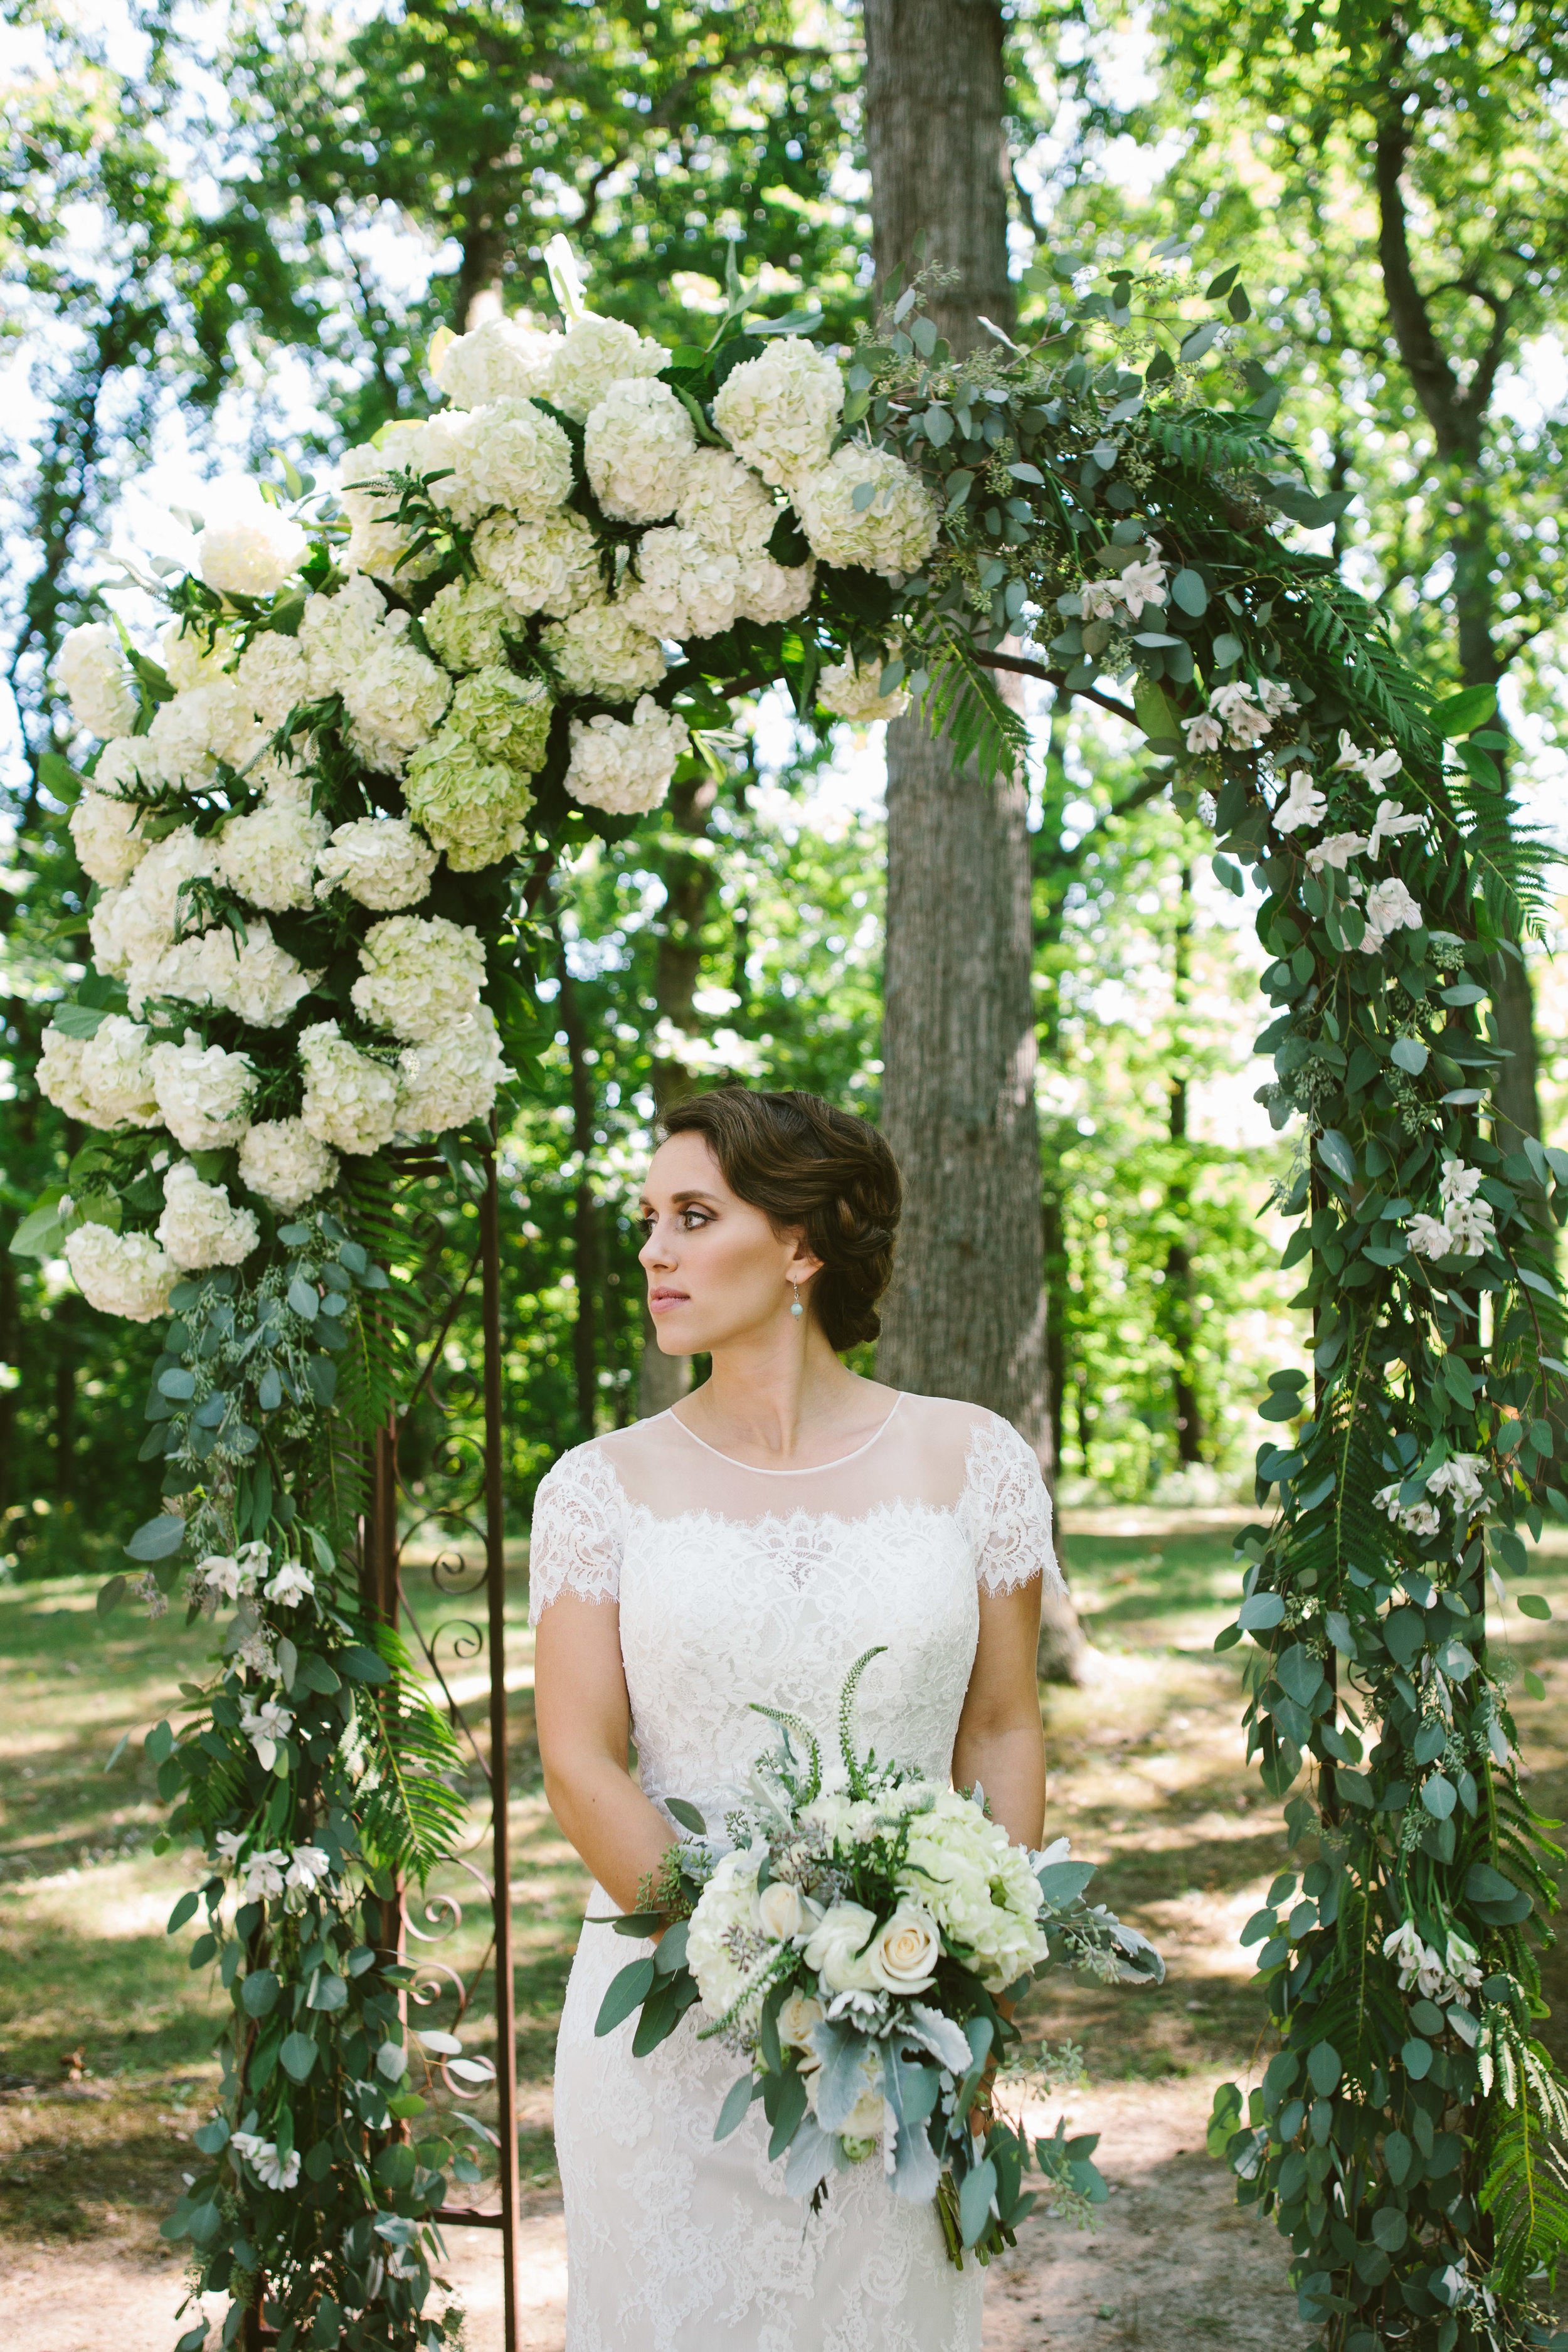 grand_rapids_wedding_rockford_wedding_richard_app_gallery_wedding_grand_rapids_wedding_photographer_summer_wedding_wabasis_lake_park_wedding_rustic_wedding-29.jpg